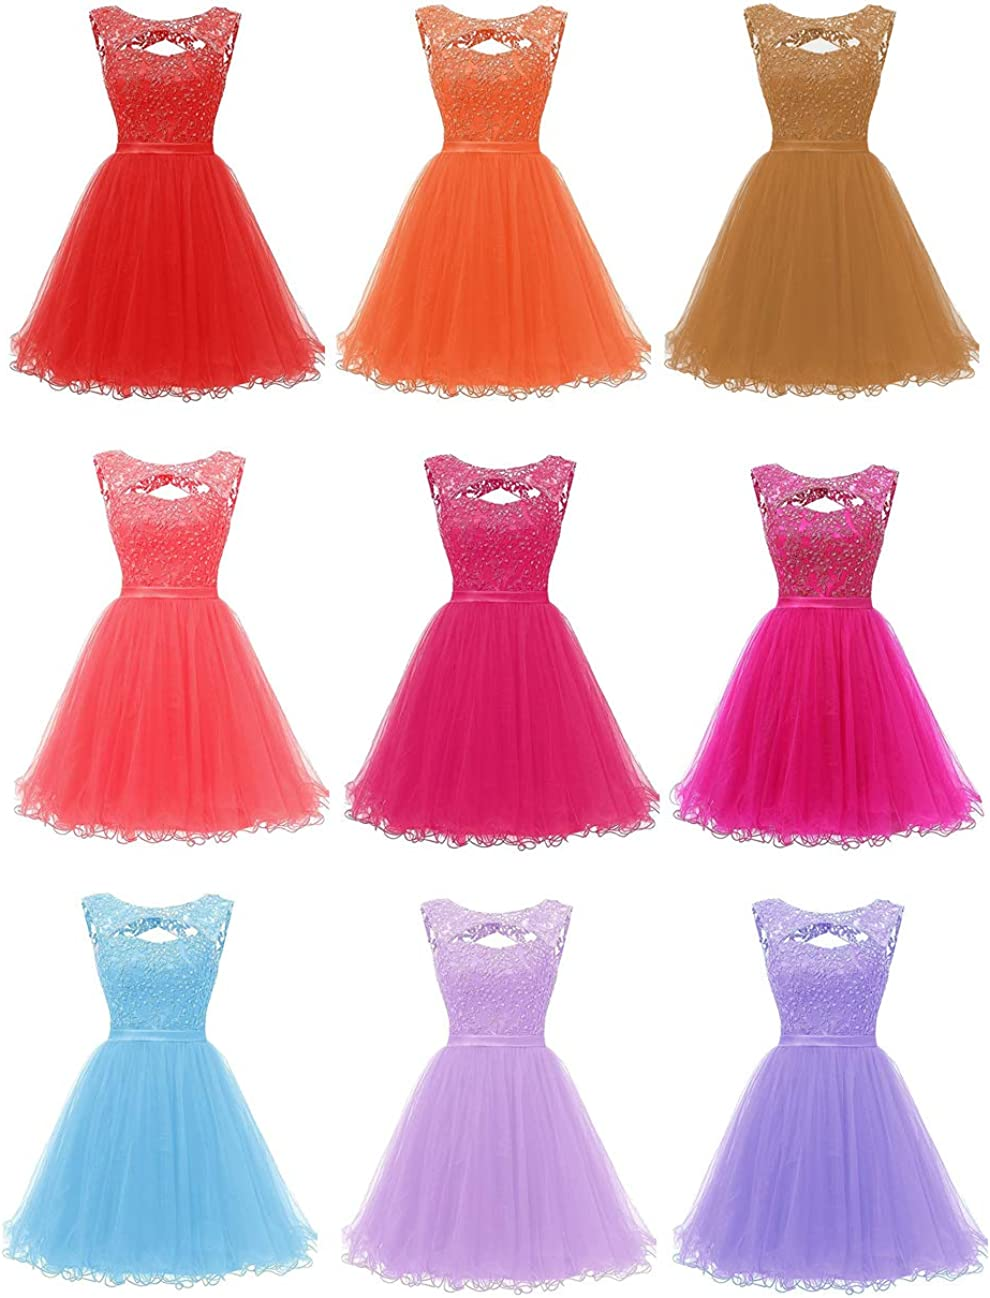 Promworld Women's Lace Appliques Open Back Sequins Homecoming Dresses Short A-line Graduation Party Cocktail Gowns